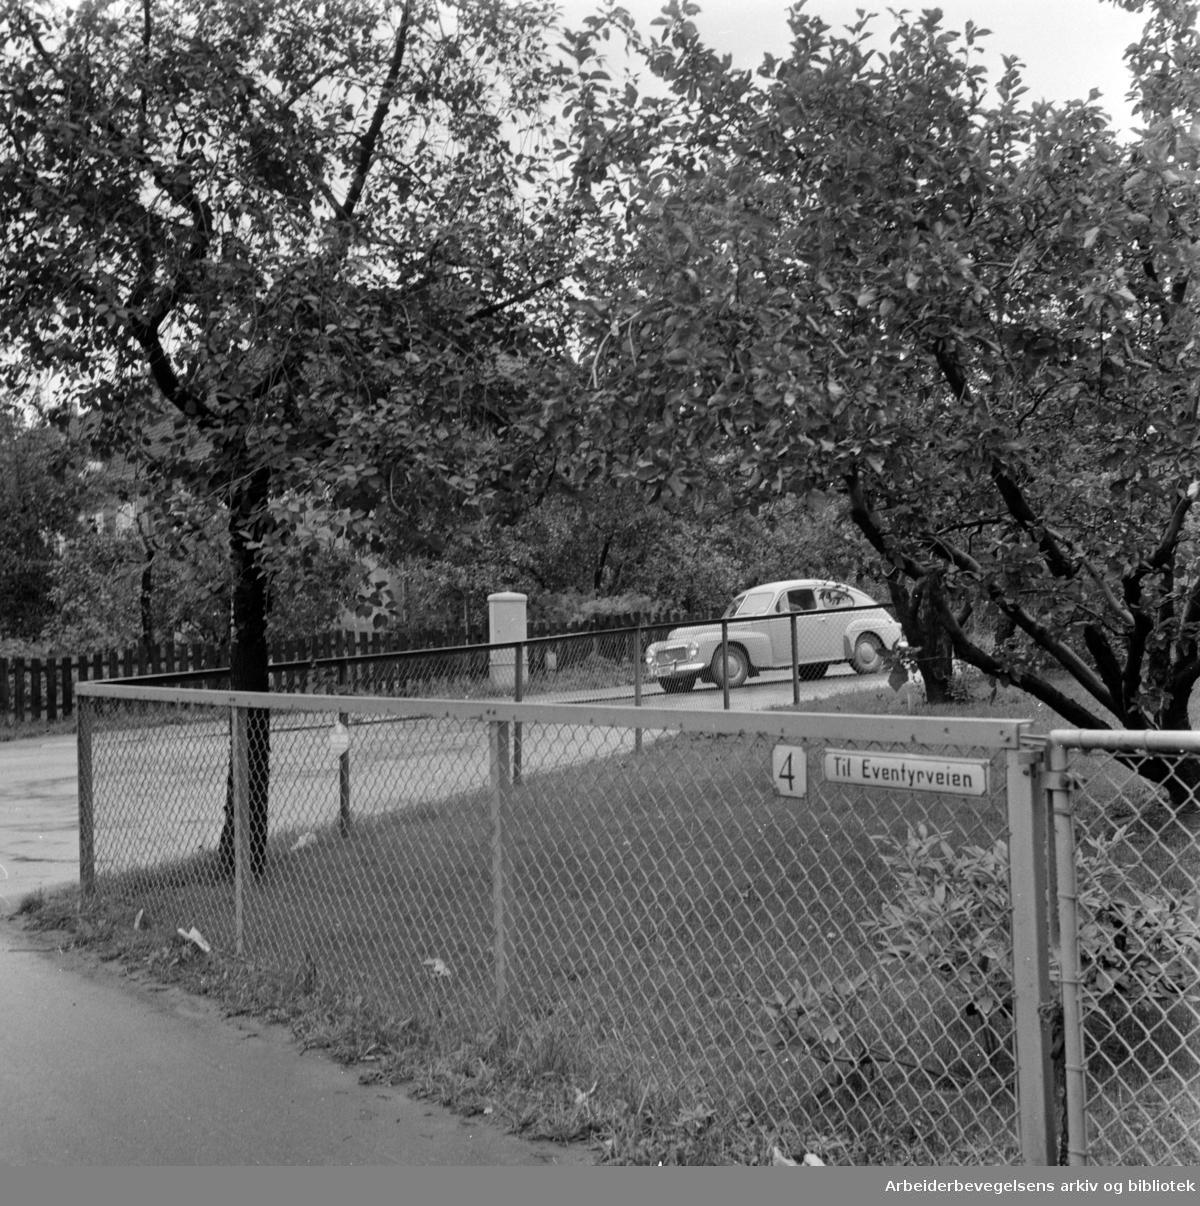 Ullevål Hageby. Trafikkfeller fjernes. Krysset Sognsveien - Eventyrveien. Oktober 1958